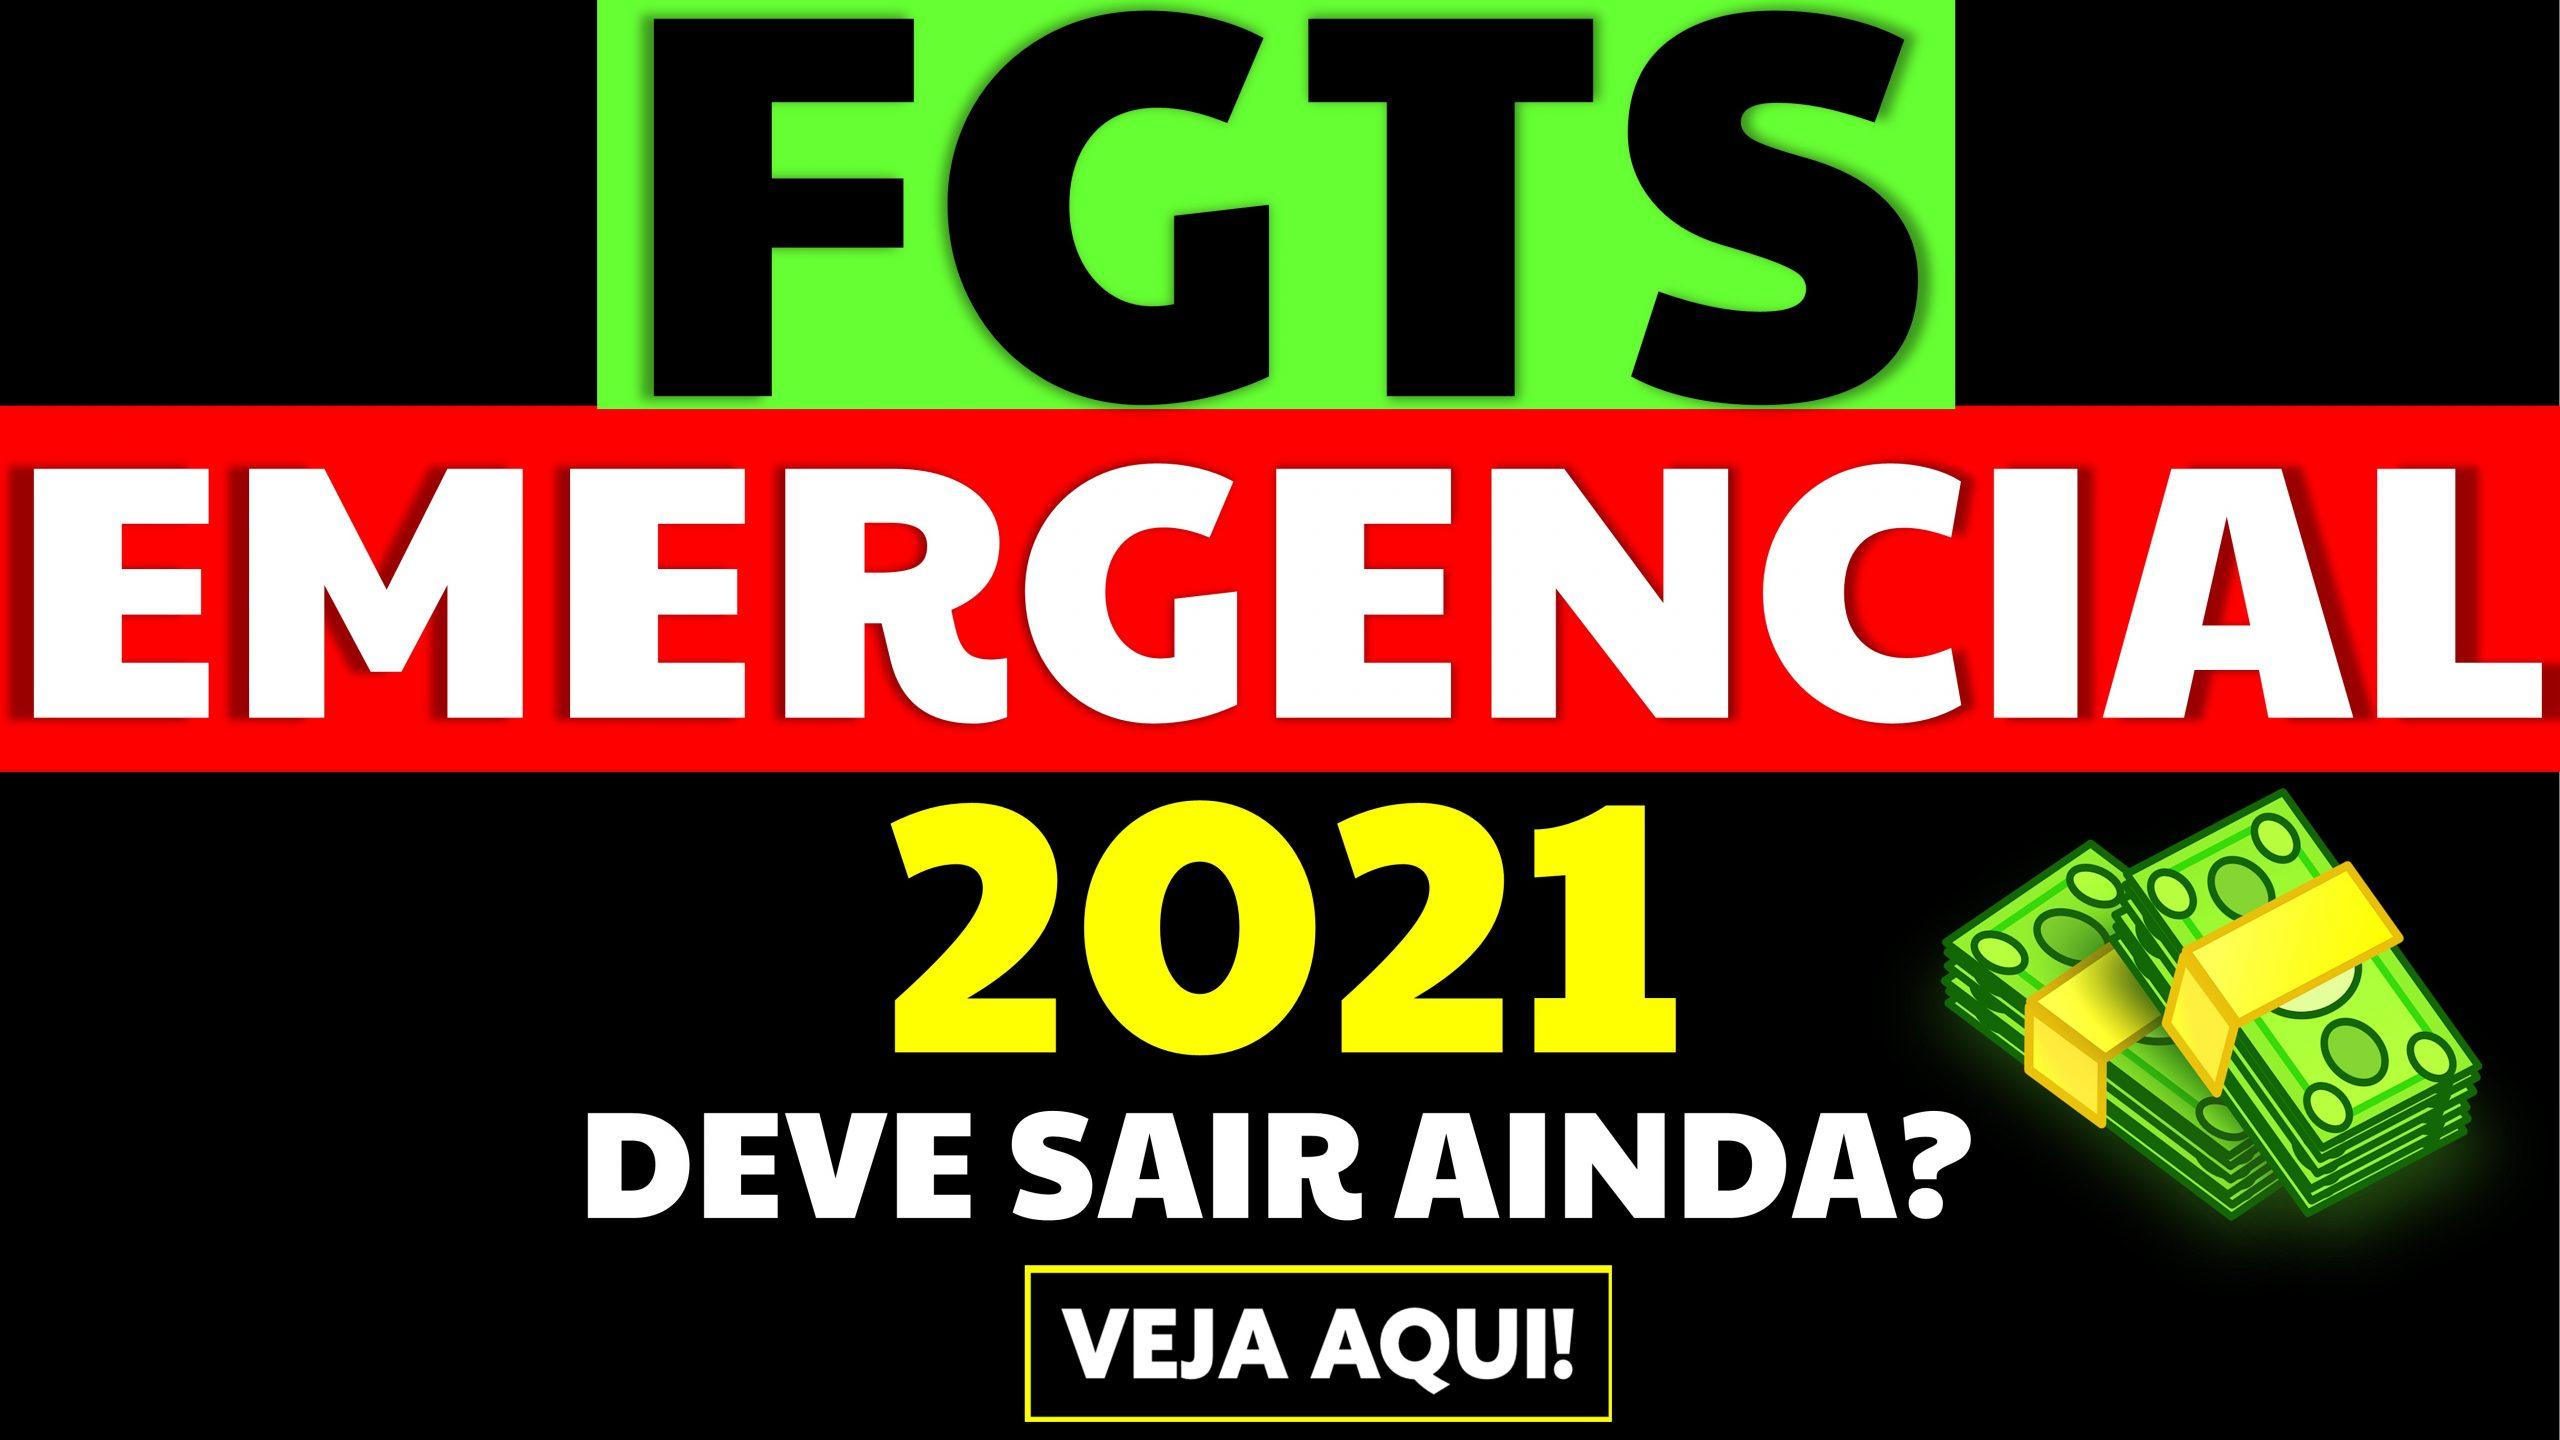 Haverá FGTS Emergencial em 2021?